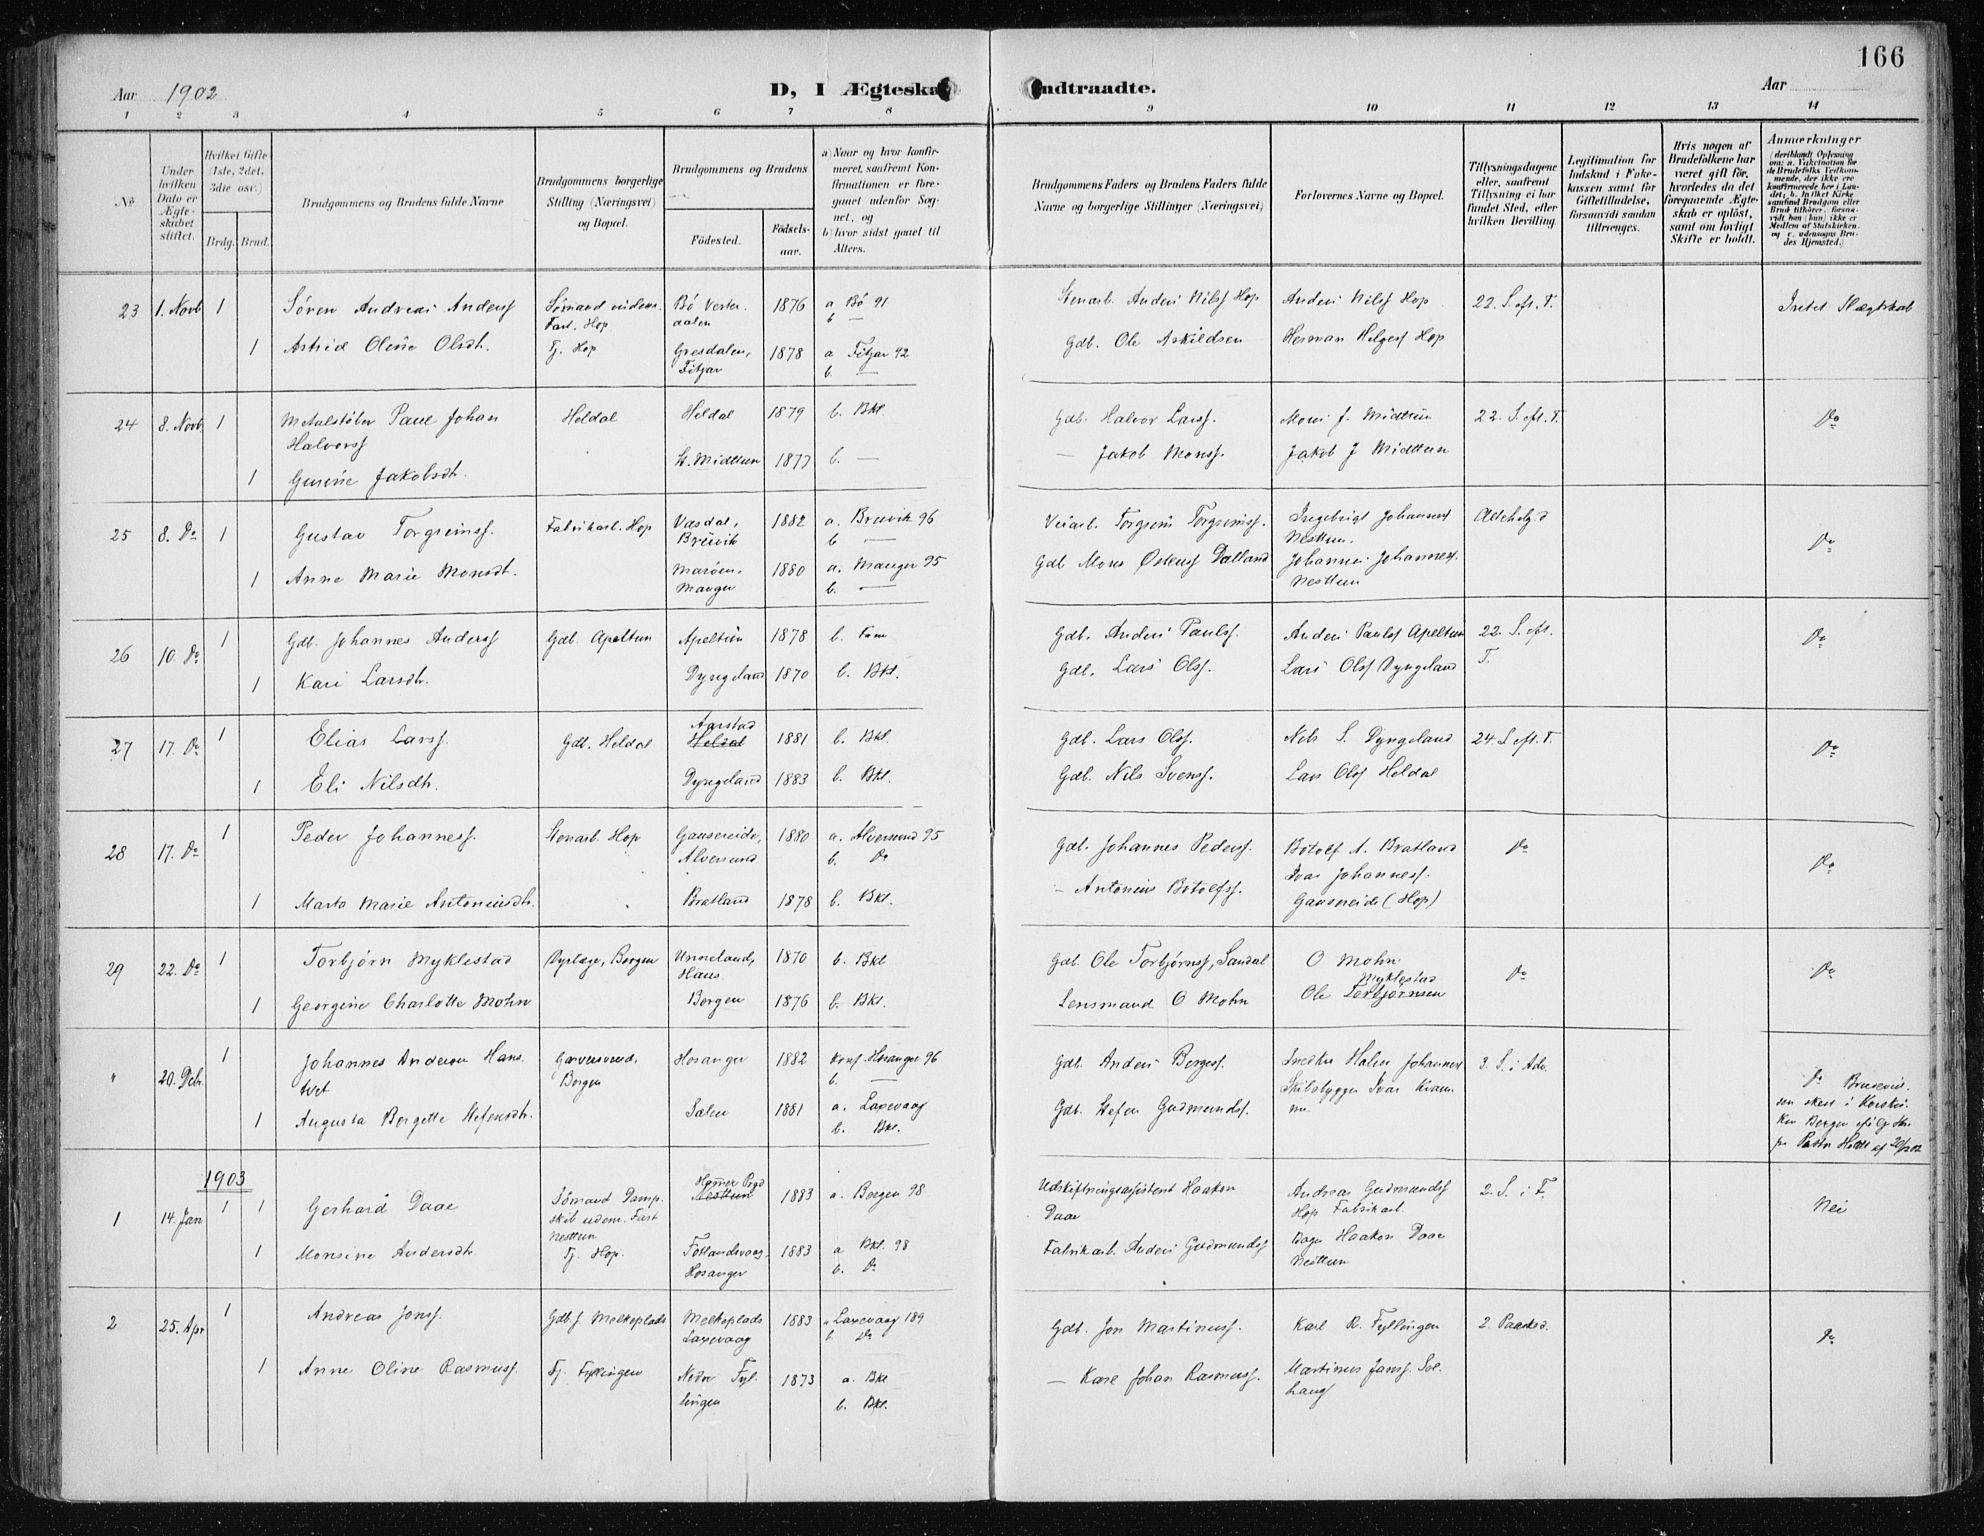 SAB, Fana Sokneprestembete, H/Haa/Haai/L0003: Ministerialbok nr. I 3, 1900-1912, s. 166